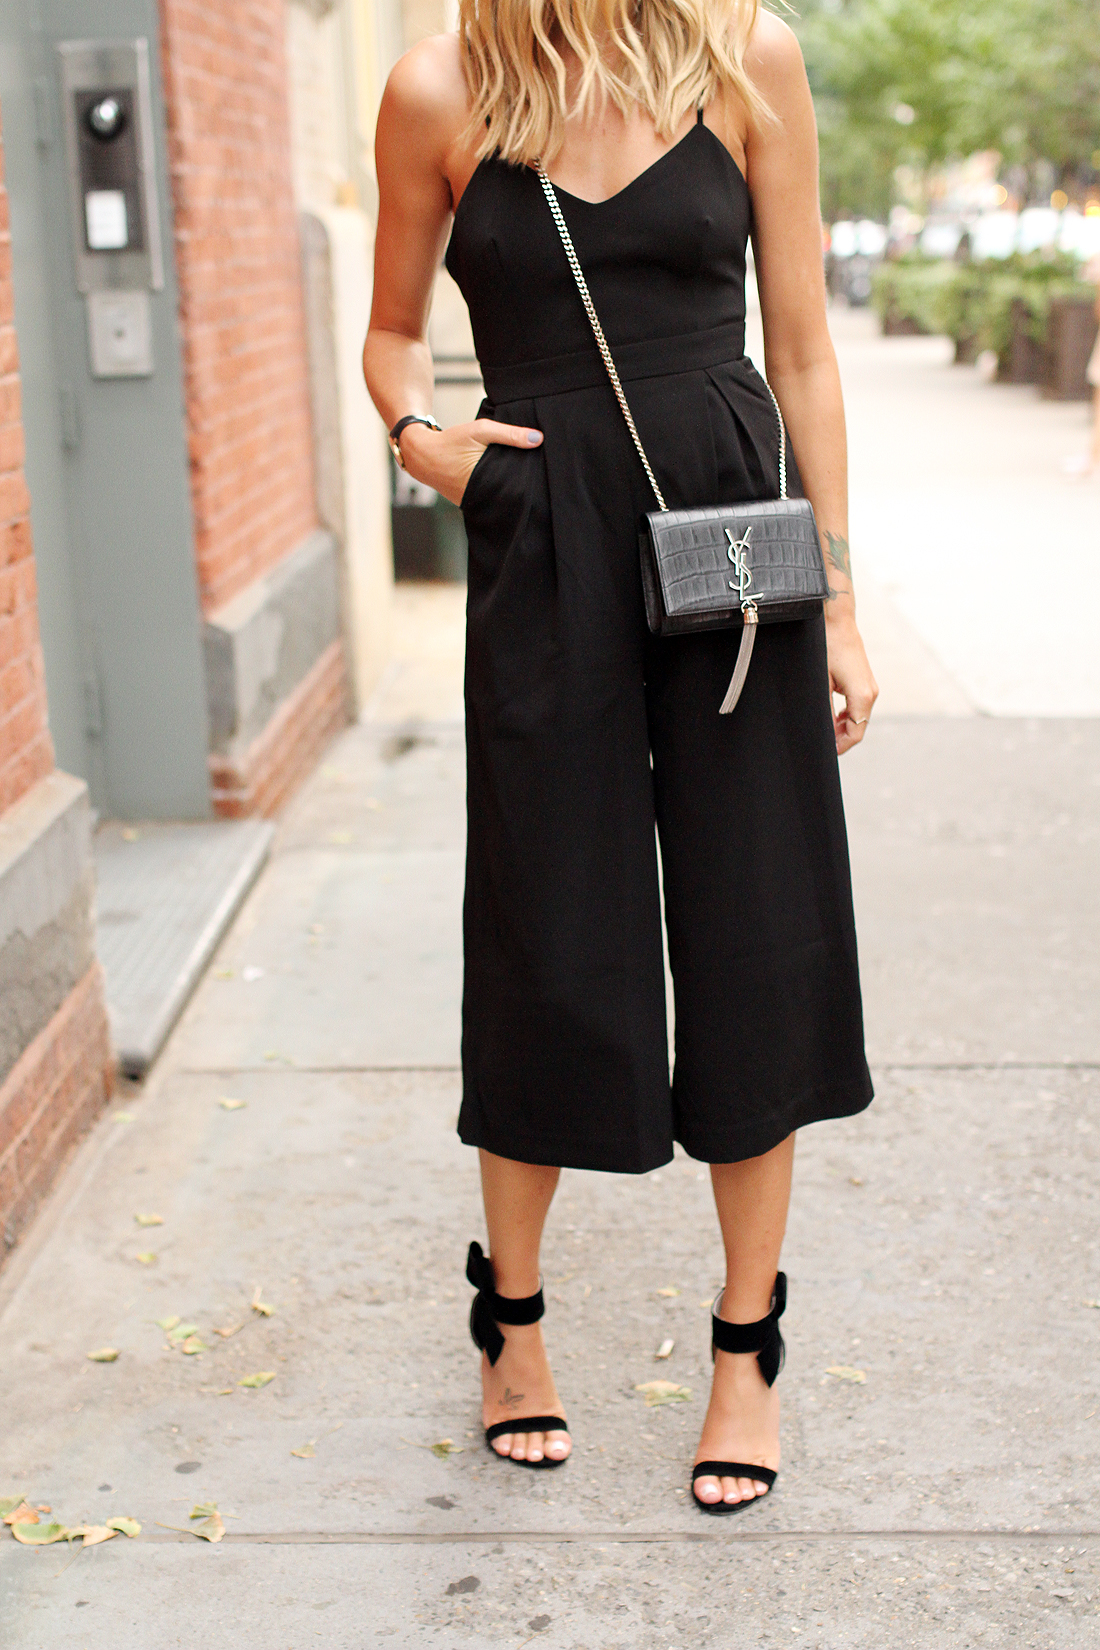 fashion-jackson-cameo-power-trip-jumpsuit-saint-laurent-cassandre-crossbody-handbag-black-bow-heels-nyfw-street-style